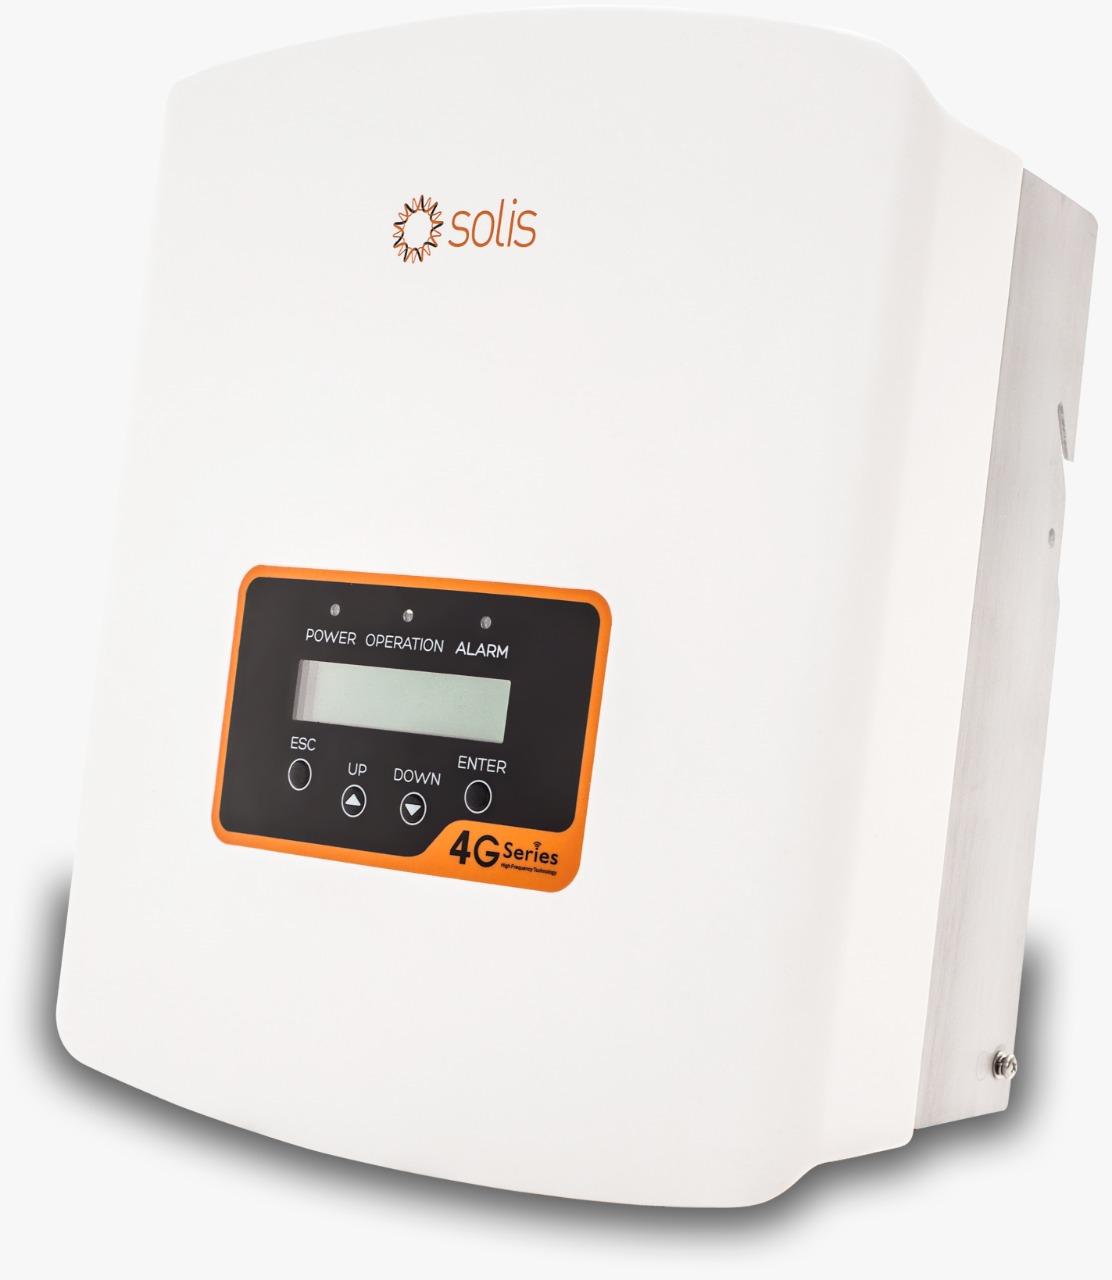 Solis 1.5 kW Mini Simple 4 G MPPT Tracker Grid Tied Solar PV IP65